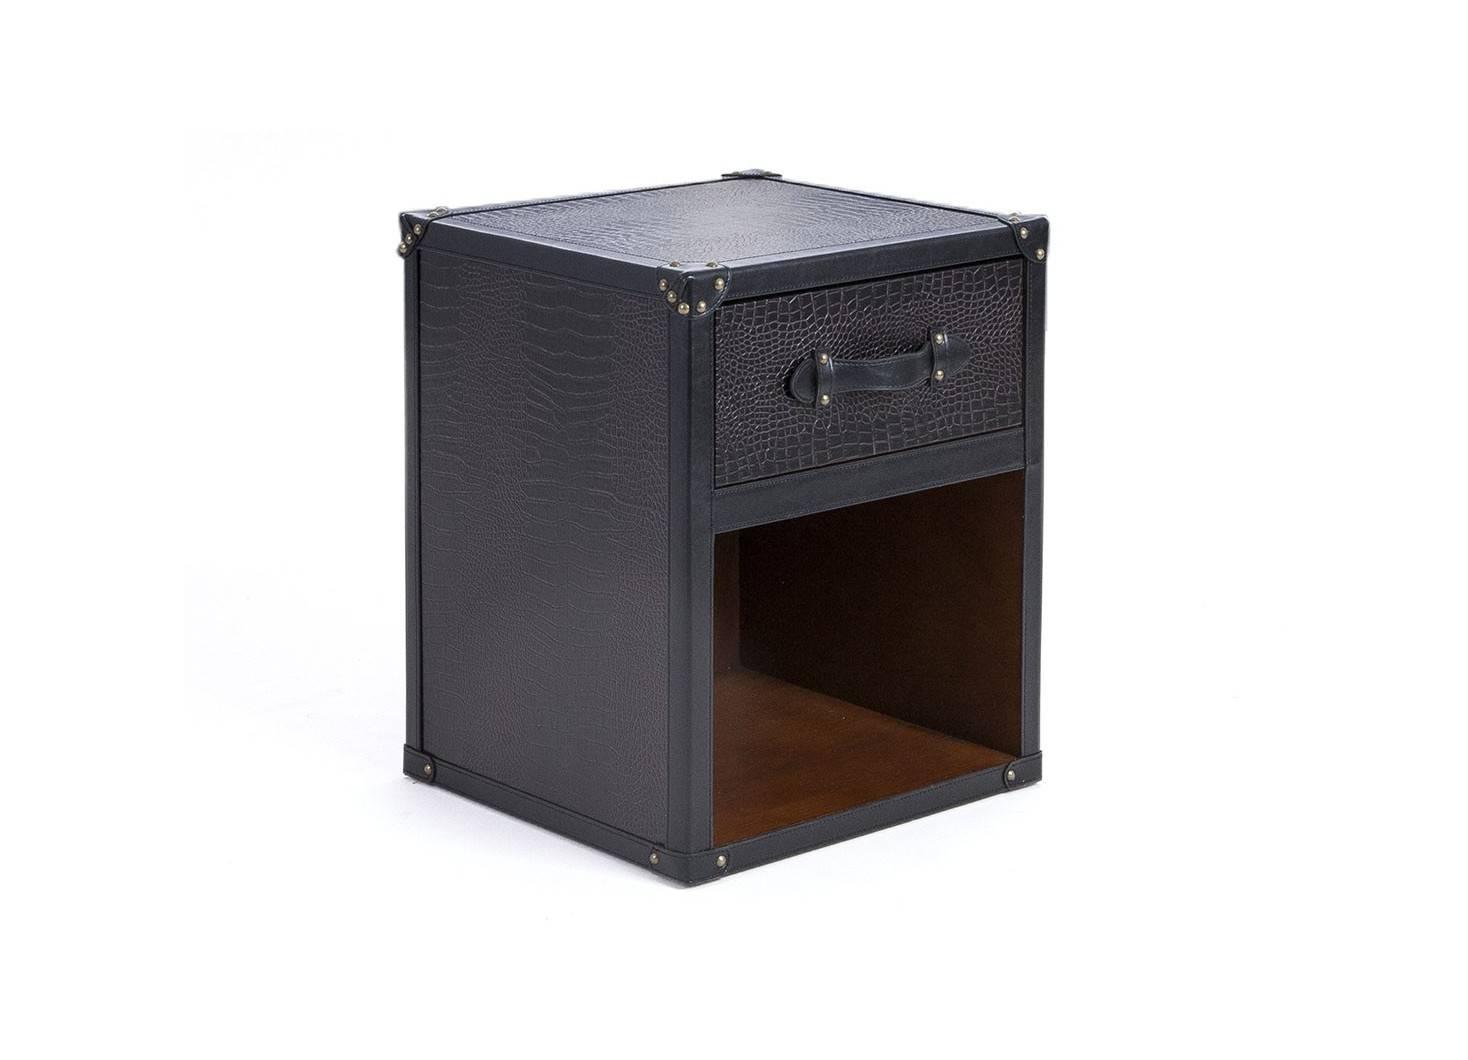 Table de chevet Cap Horn - 1 tiroir - Simili cuir croco marron fonce